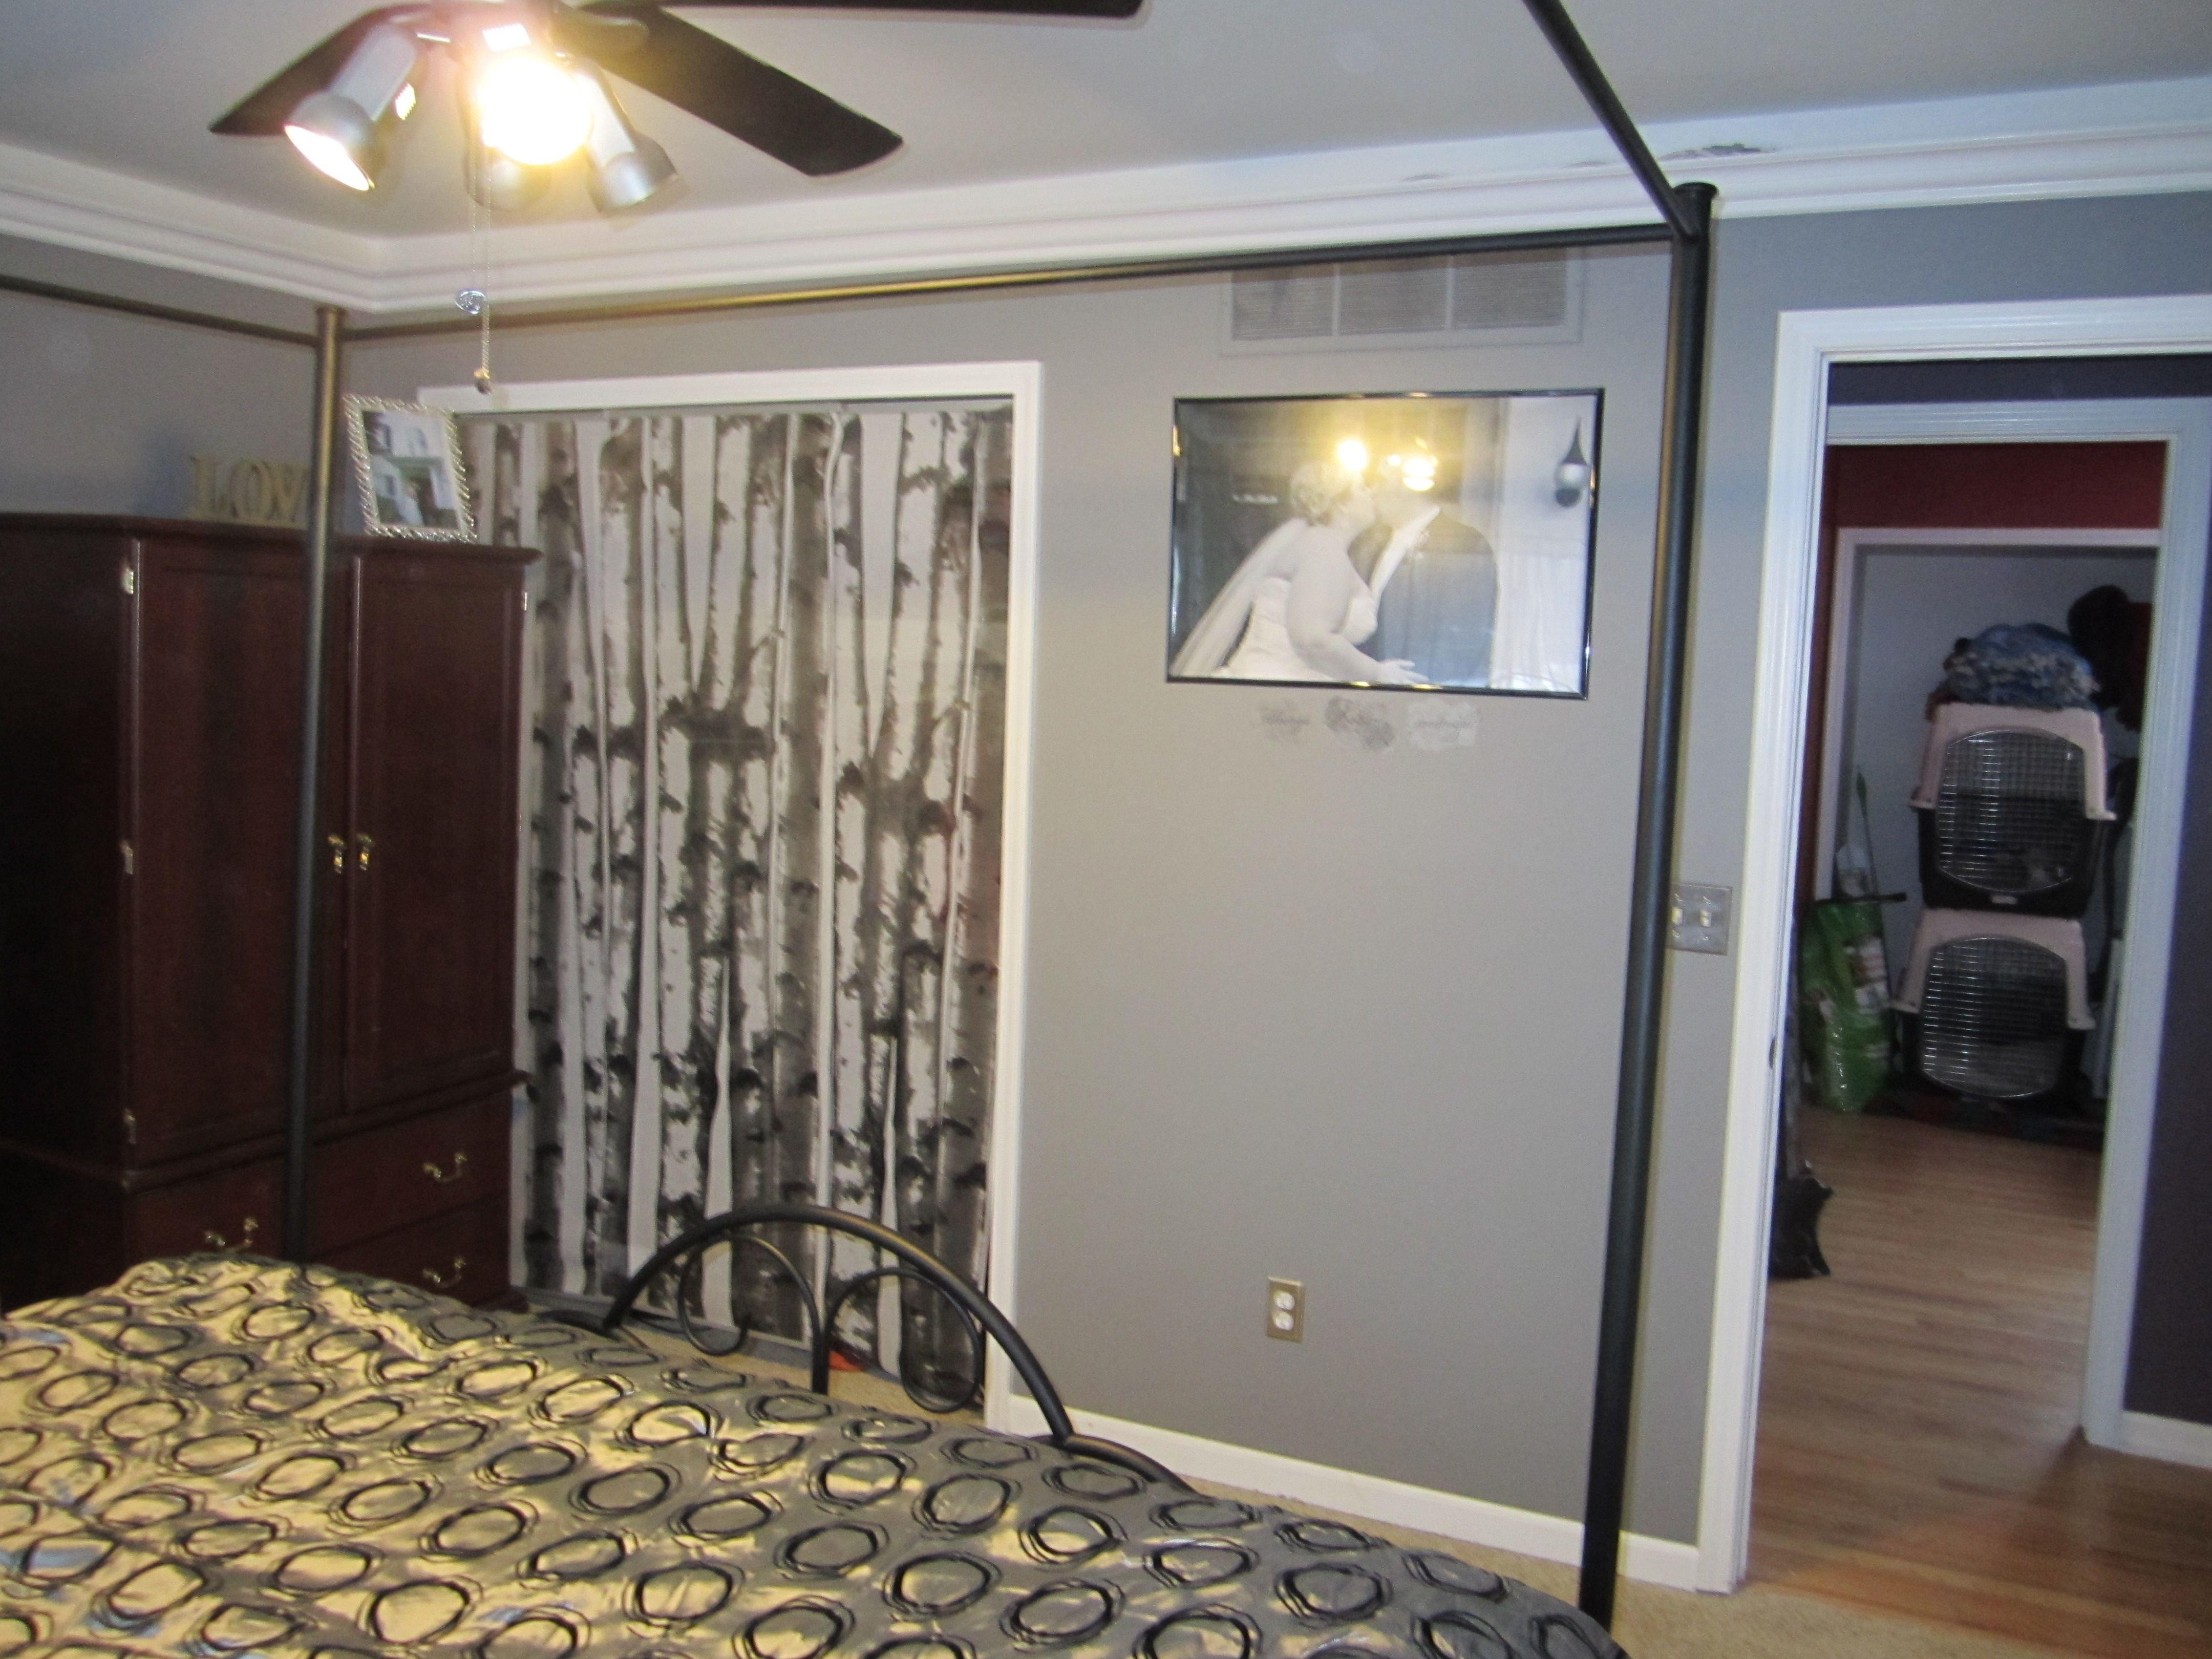 Bedroom closet door ideas istranka with regard to proportions 1280 x 960 alternatives to small closet doors the entry hall